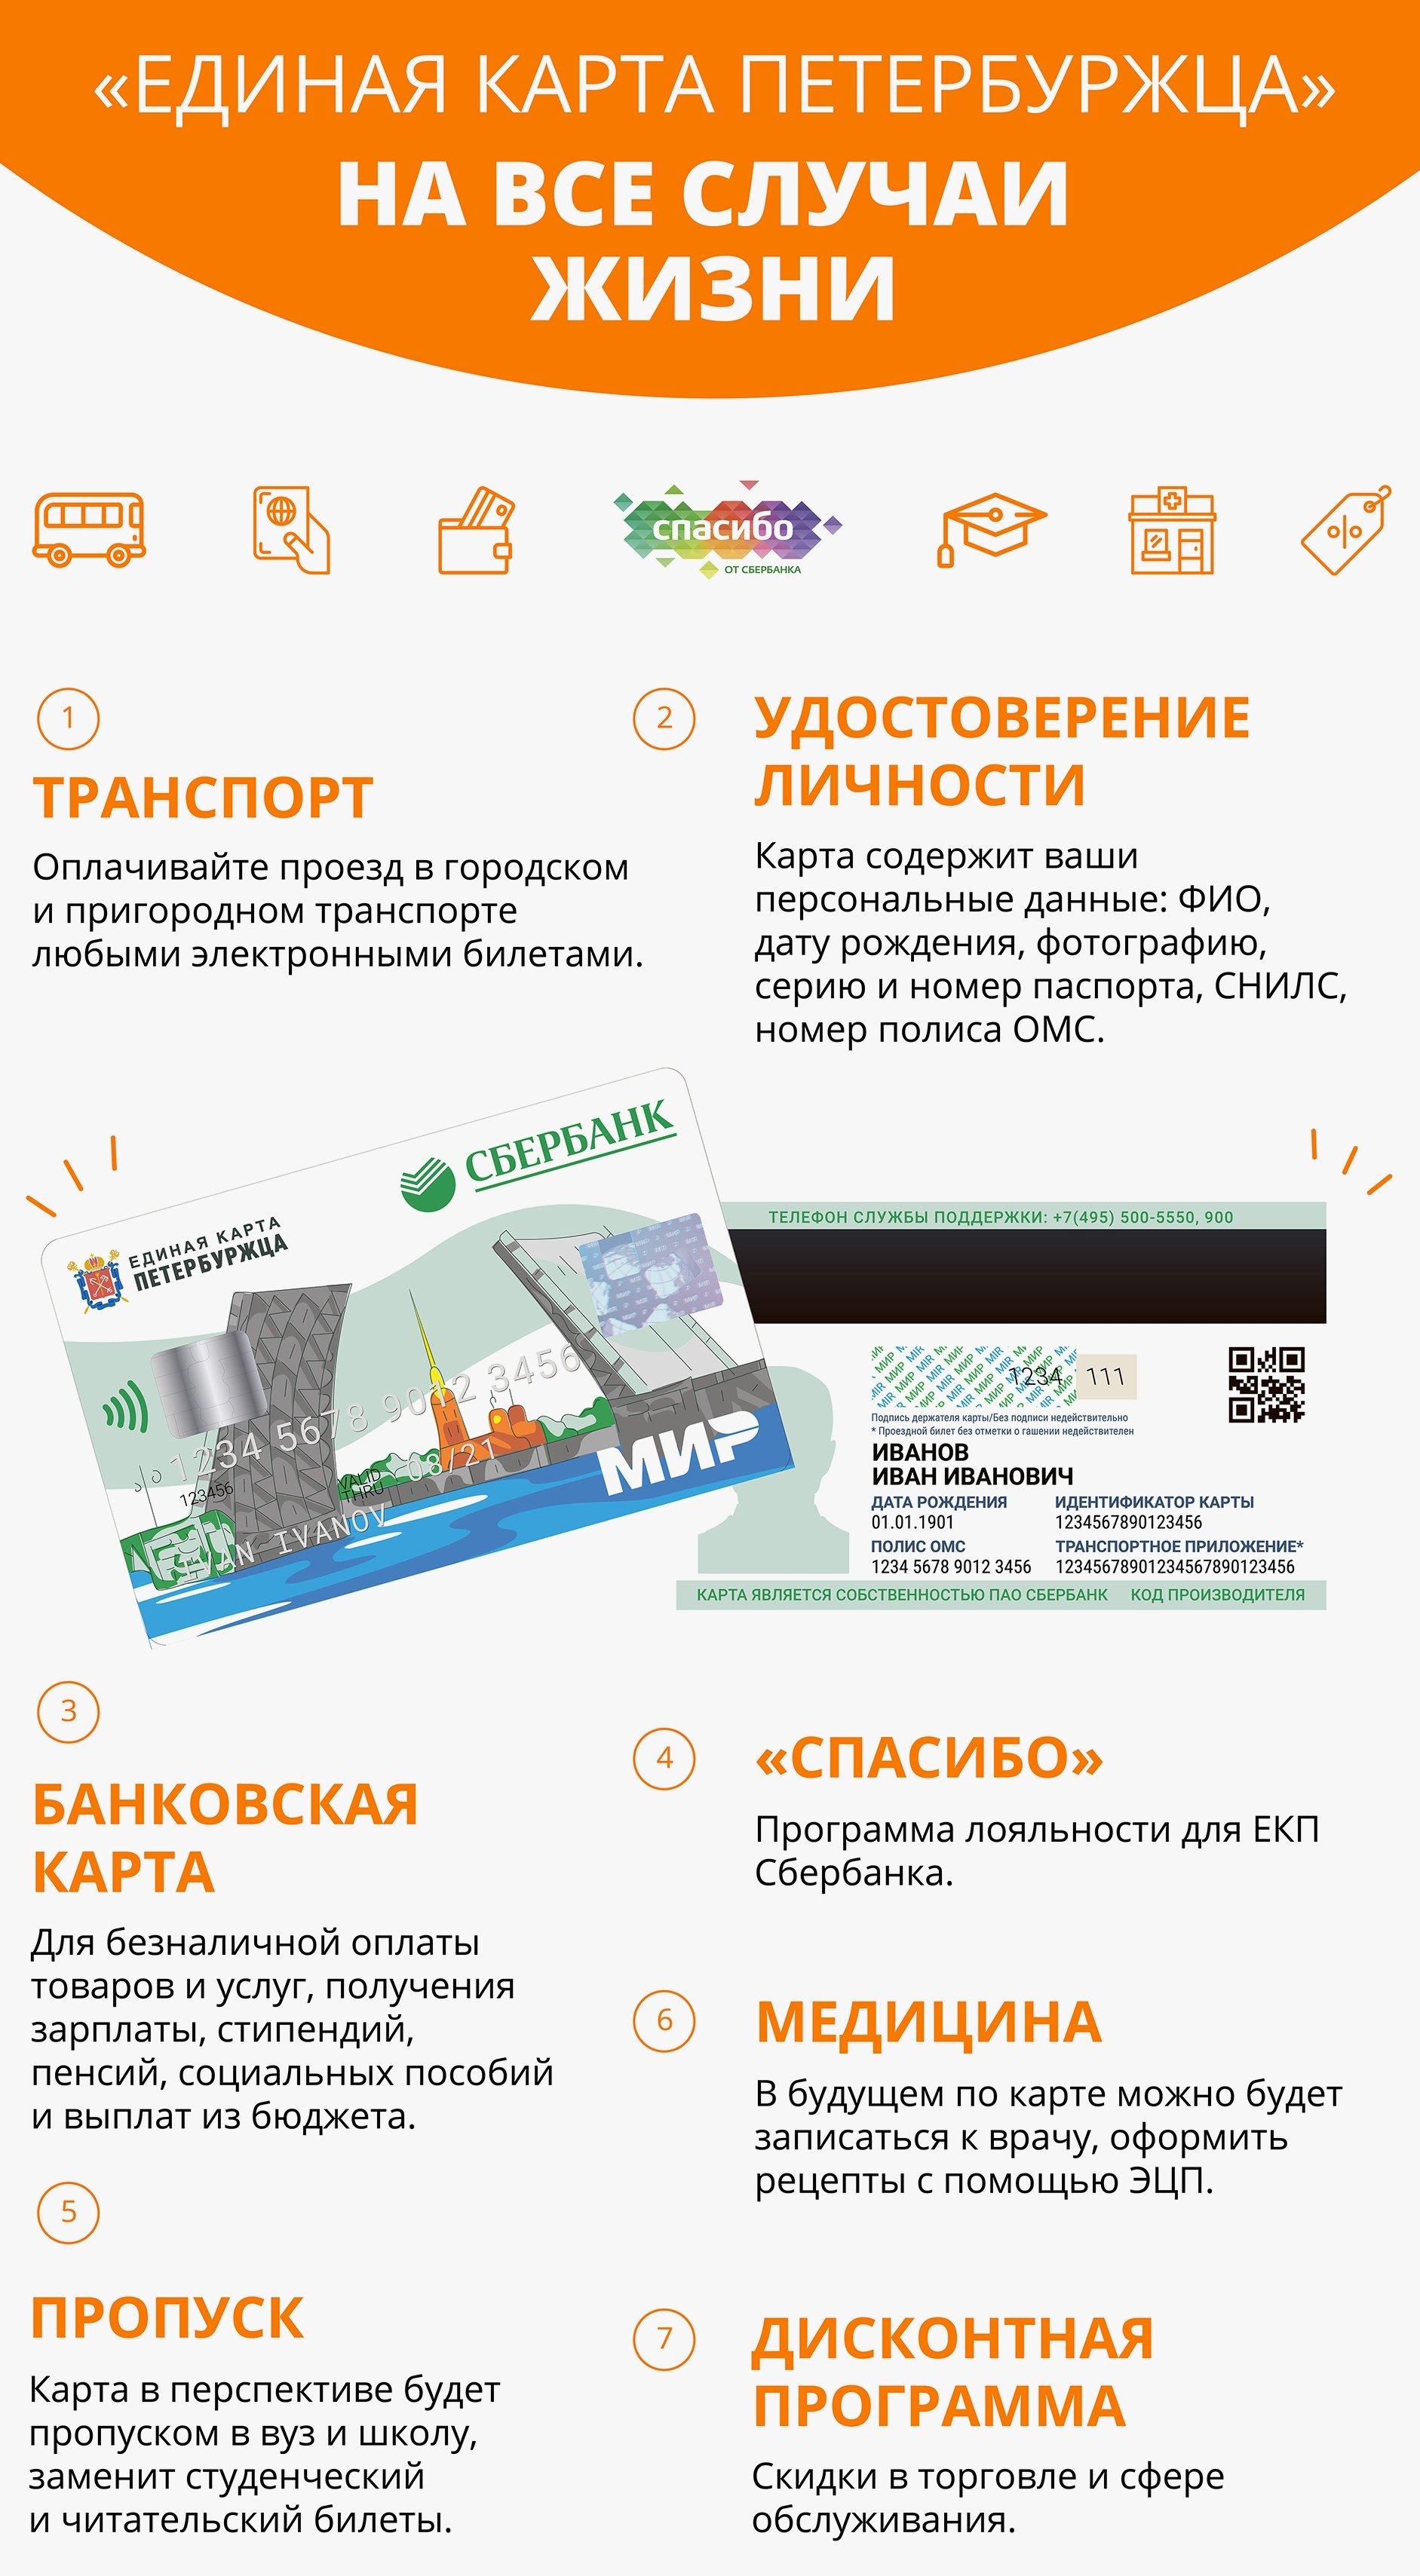 Единая карта петербуржца